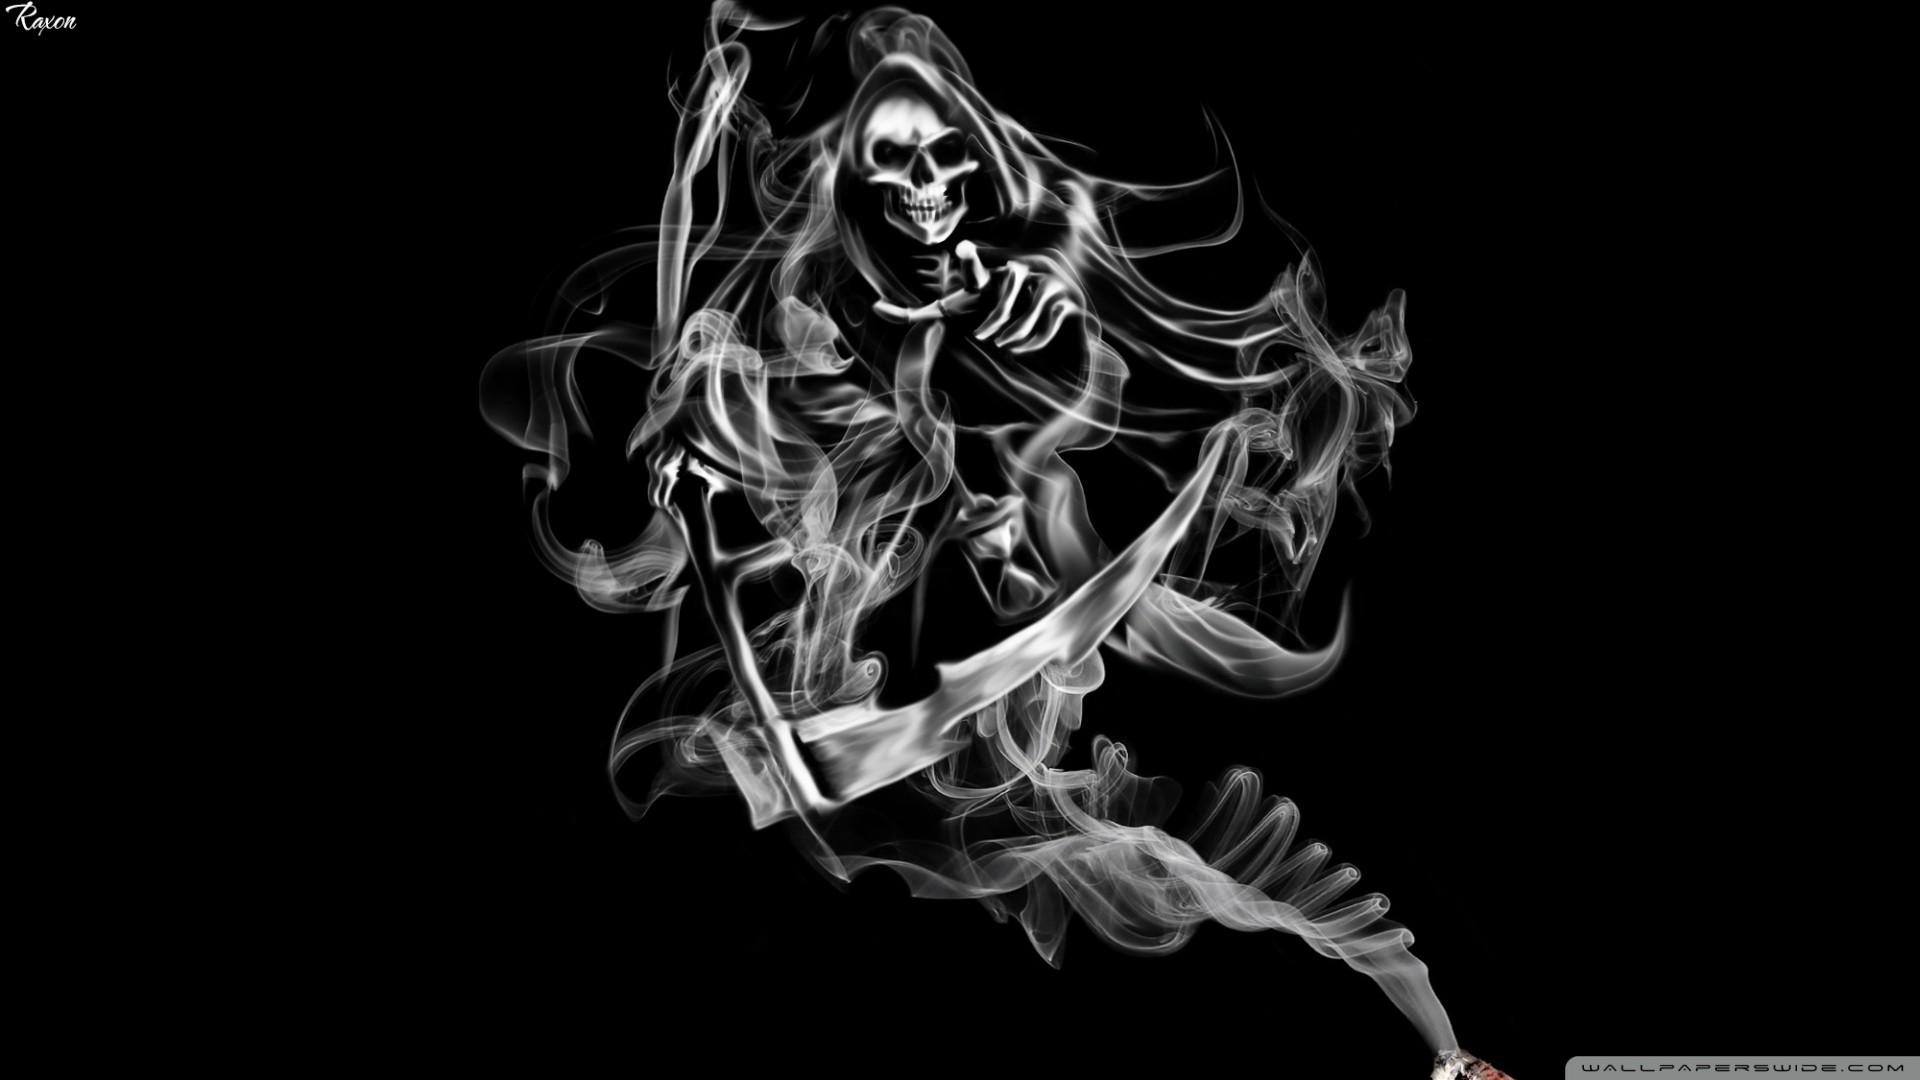 No Smoking Wallpapers ①